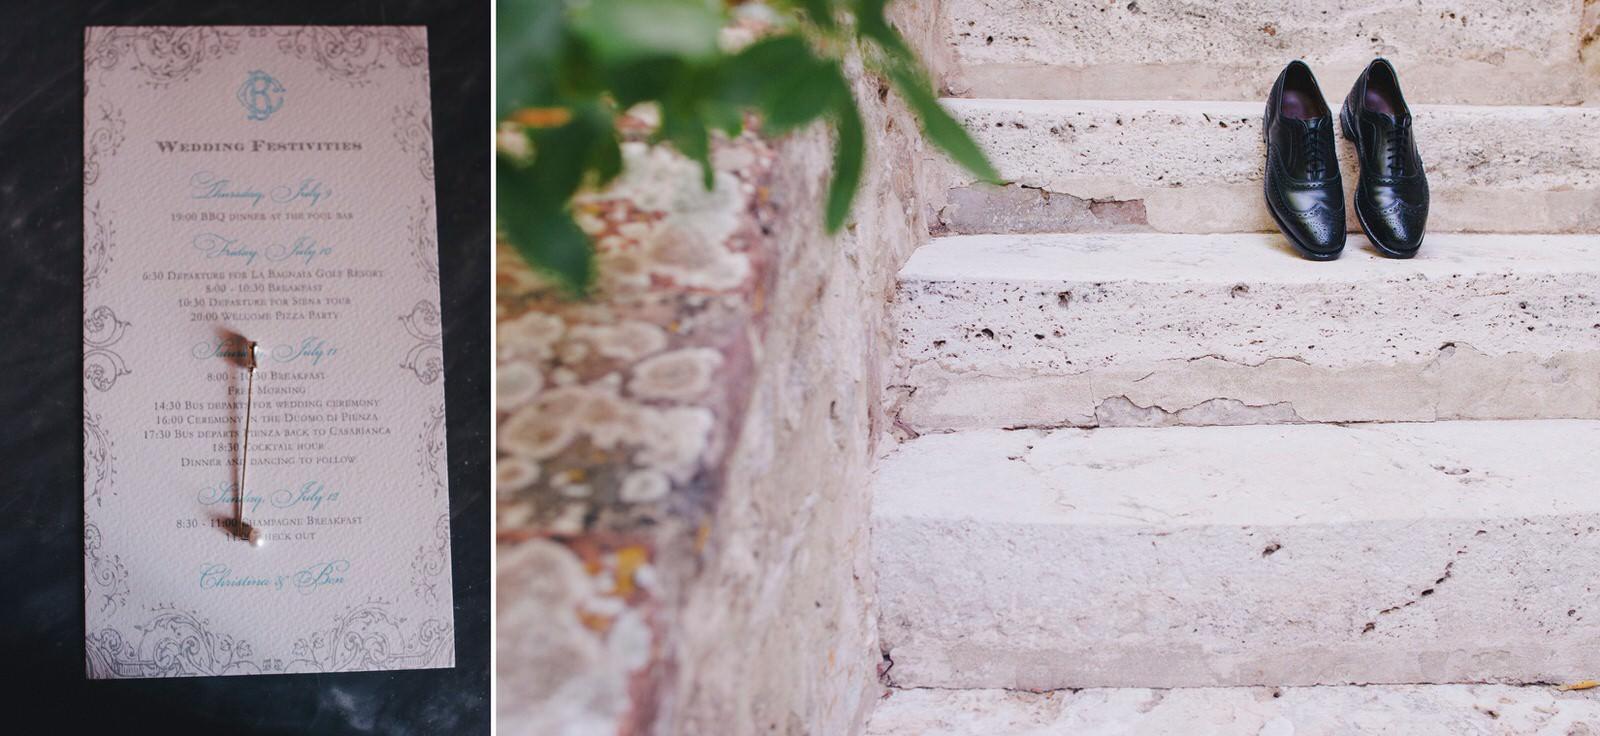 tuscany wedding groom's shoes and invitation